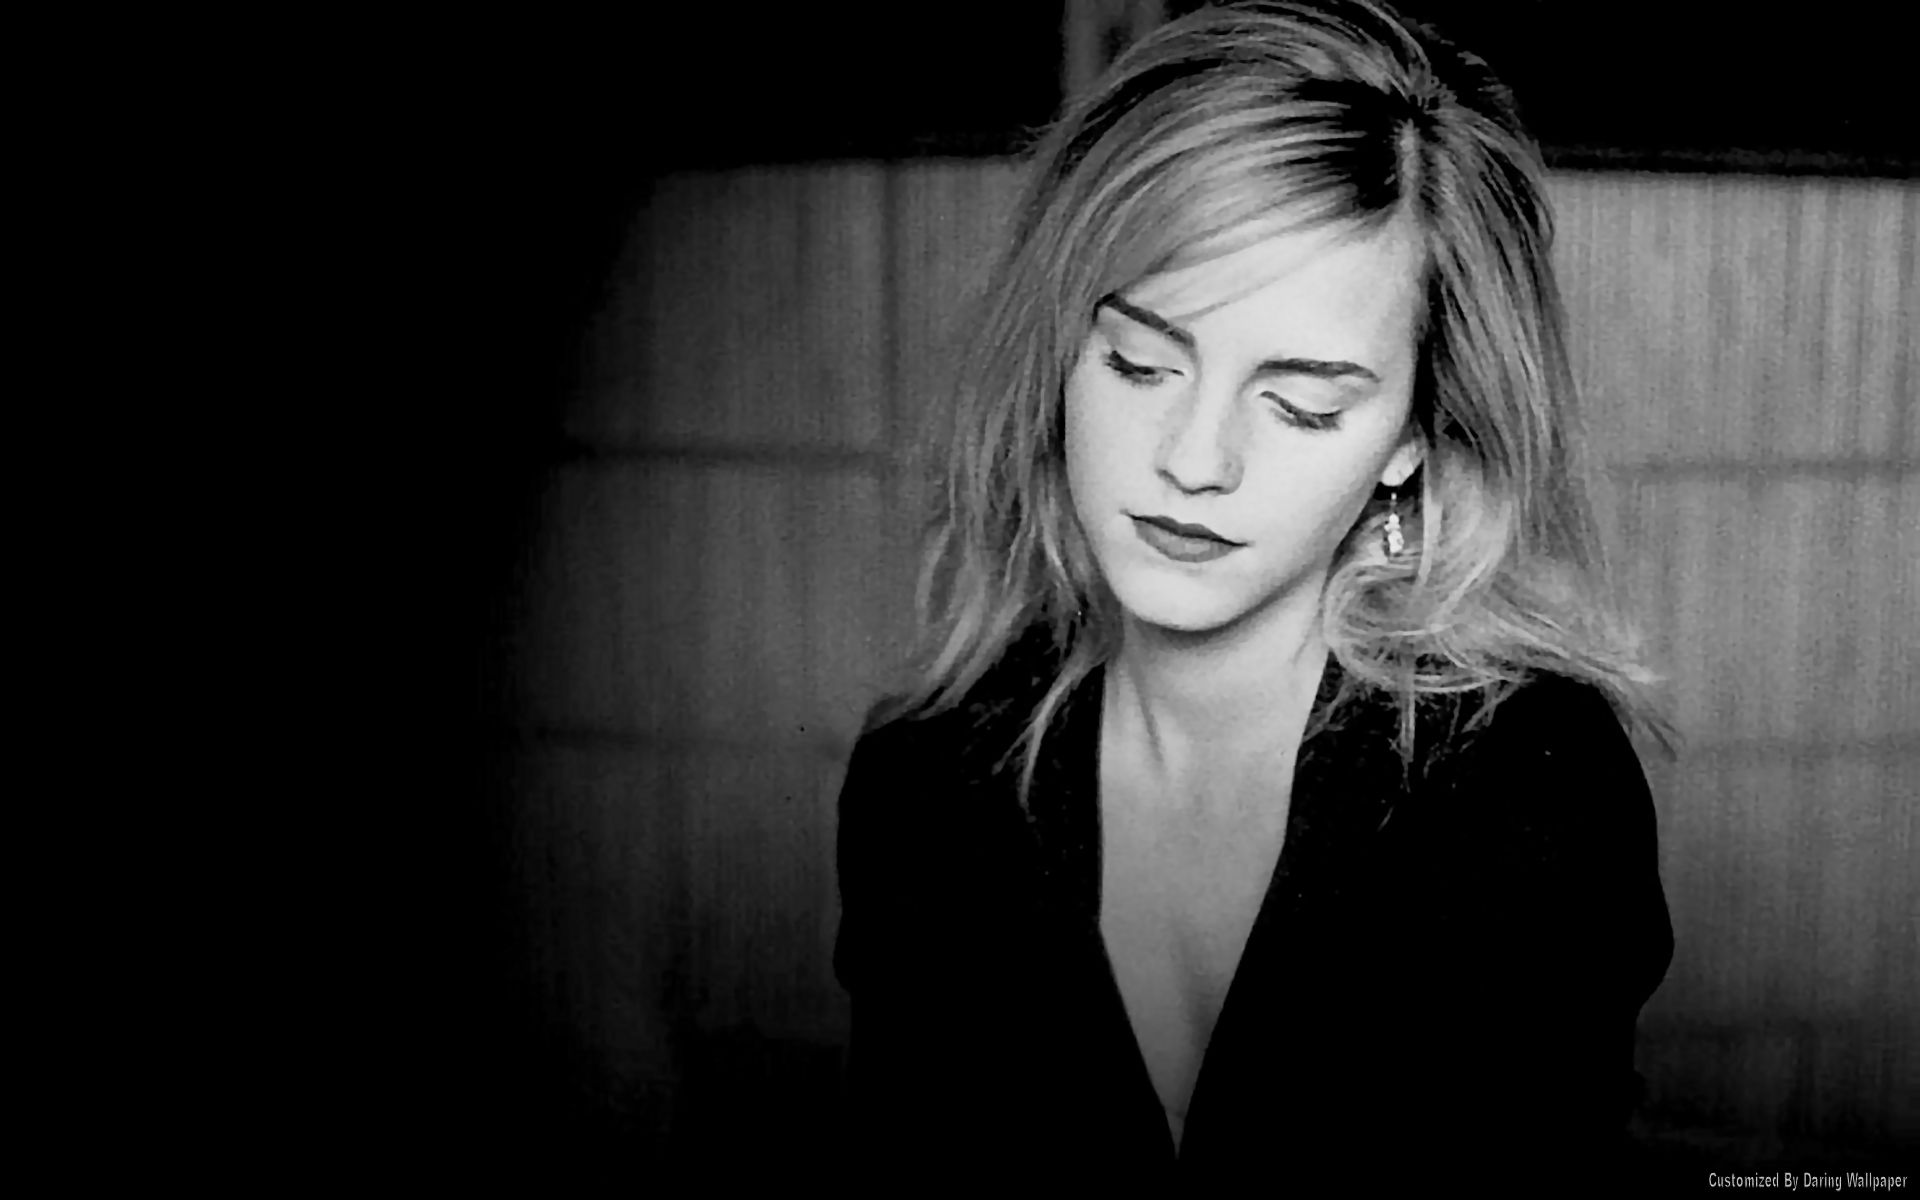 Hd wallpaper emma watson - Emma Watson Wallpapers High Resolution And Quality Download